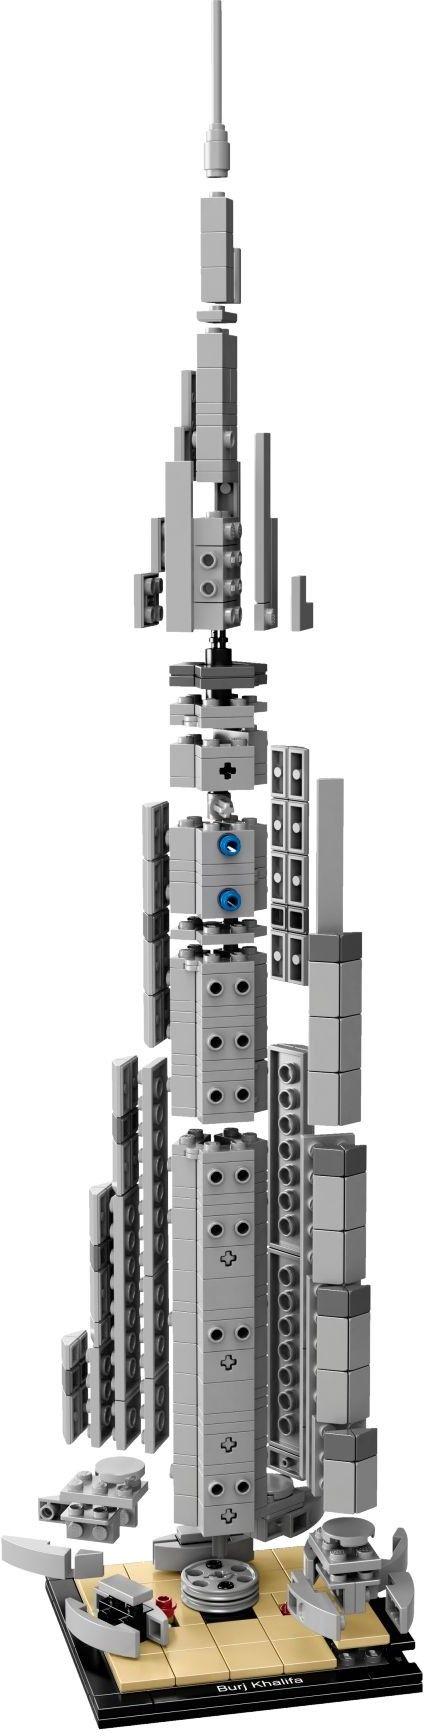 lego architecture 21031 pas cher burj khalifa. Black Bedroom Furniture Sets. Home Design Ideas